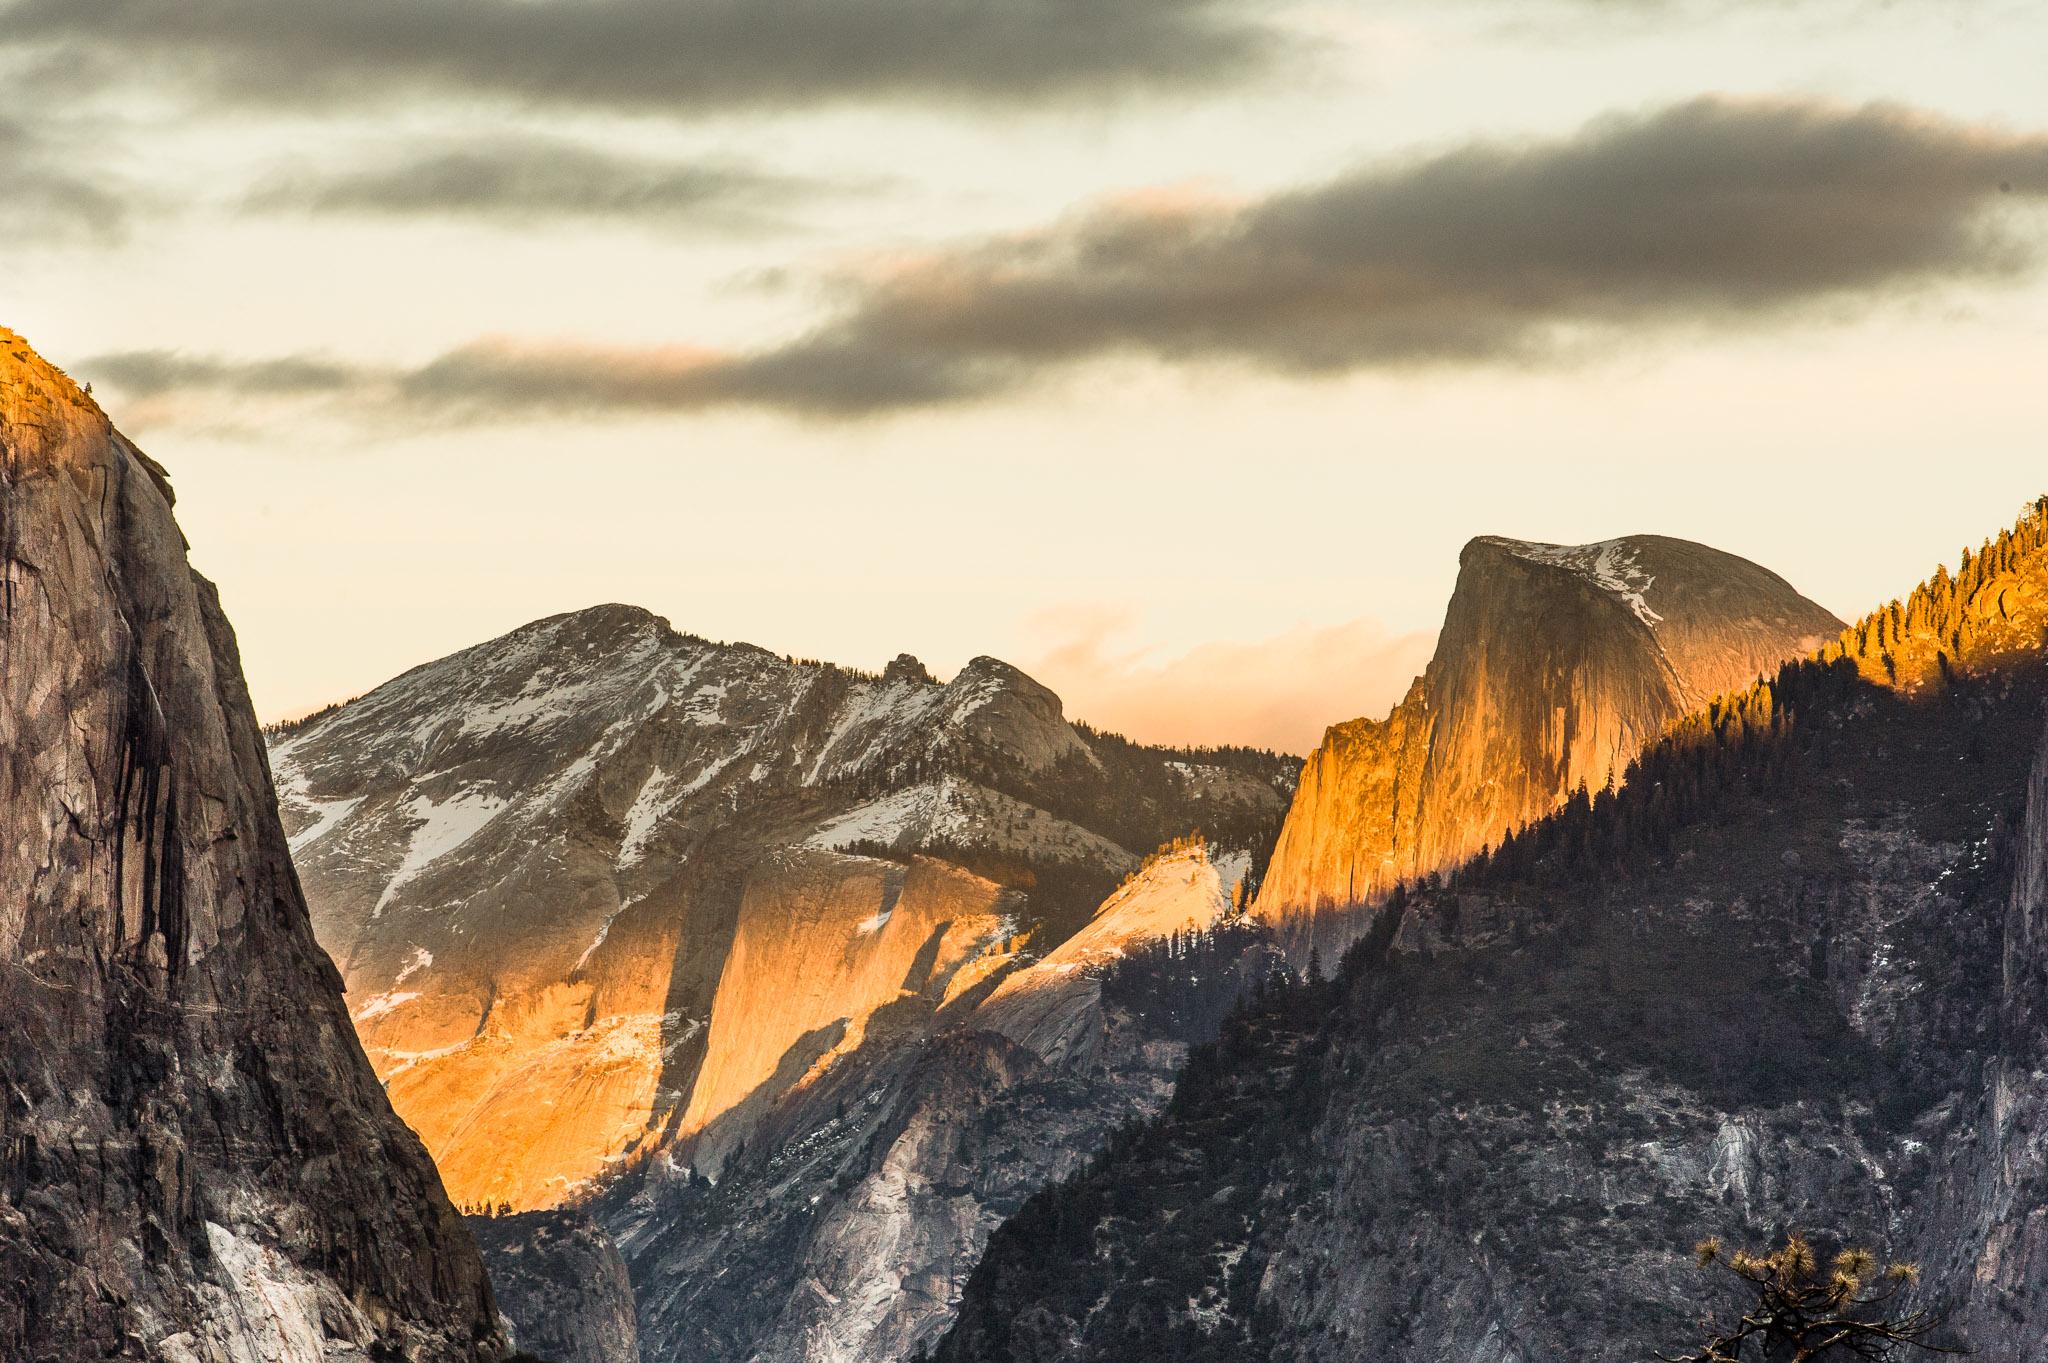 Jason-Davis-Images-Yosemite-0041.jpg